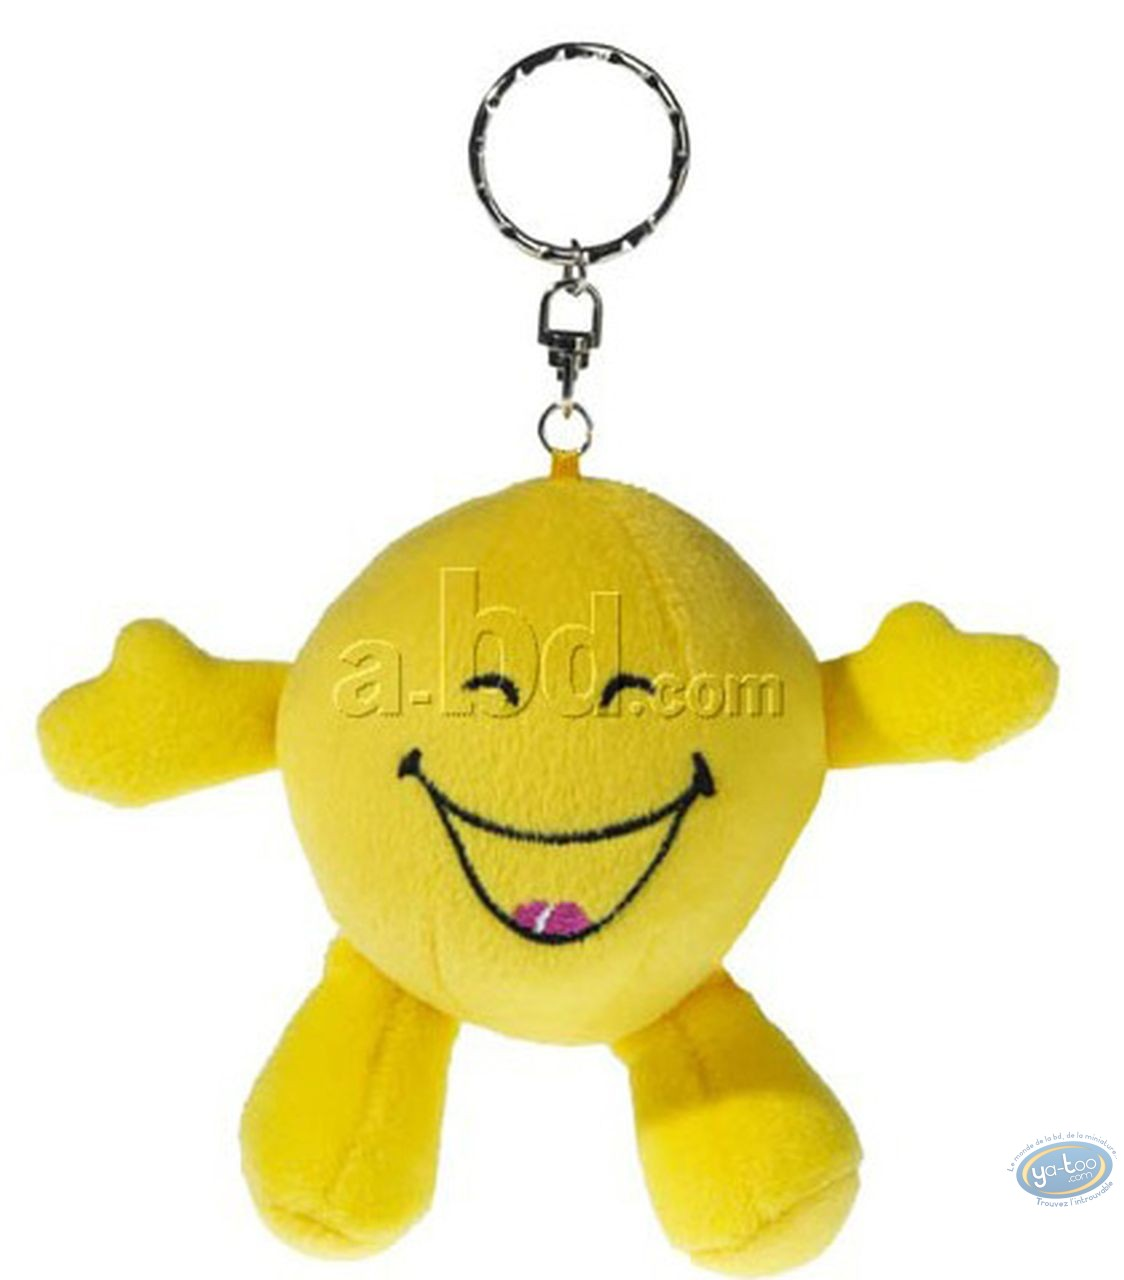 Porte-clé, Smiley : Peluche Smiley rigole